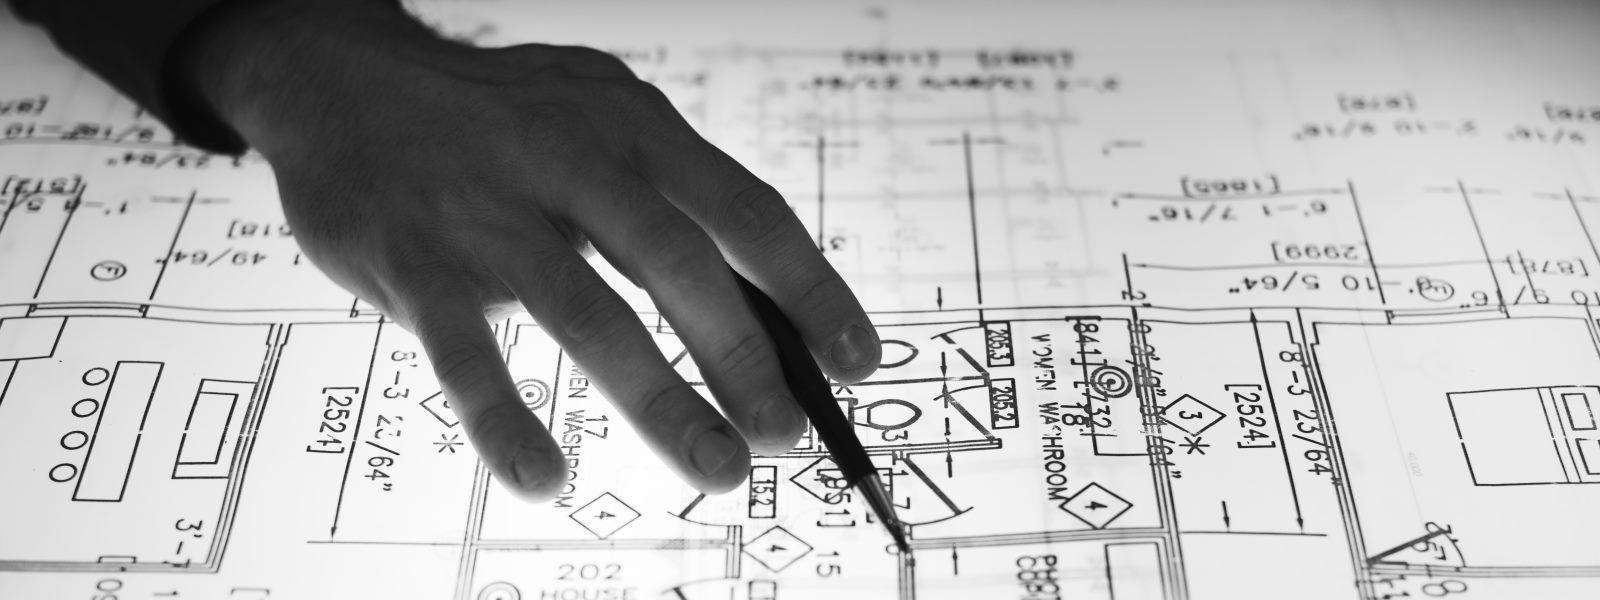 Tax implications of property development